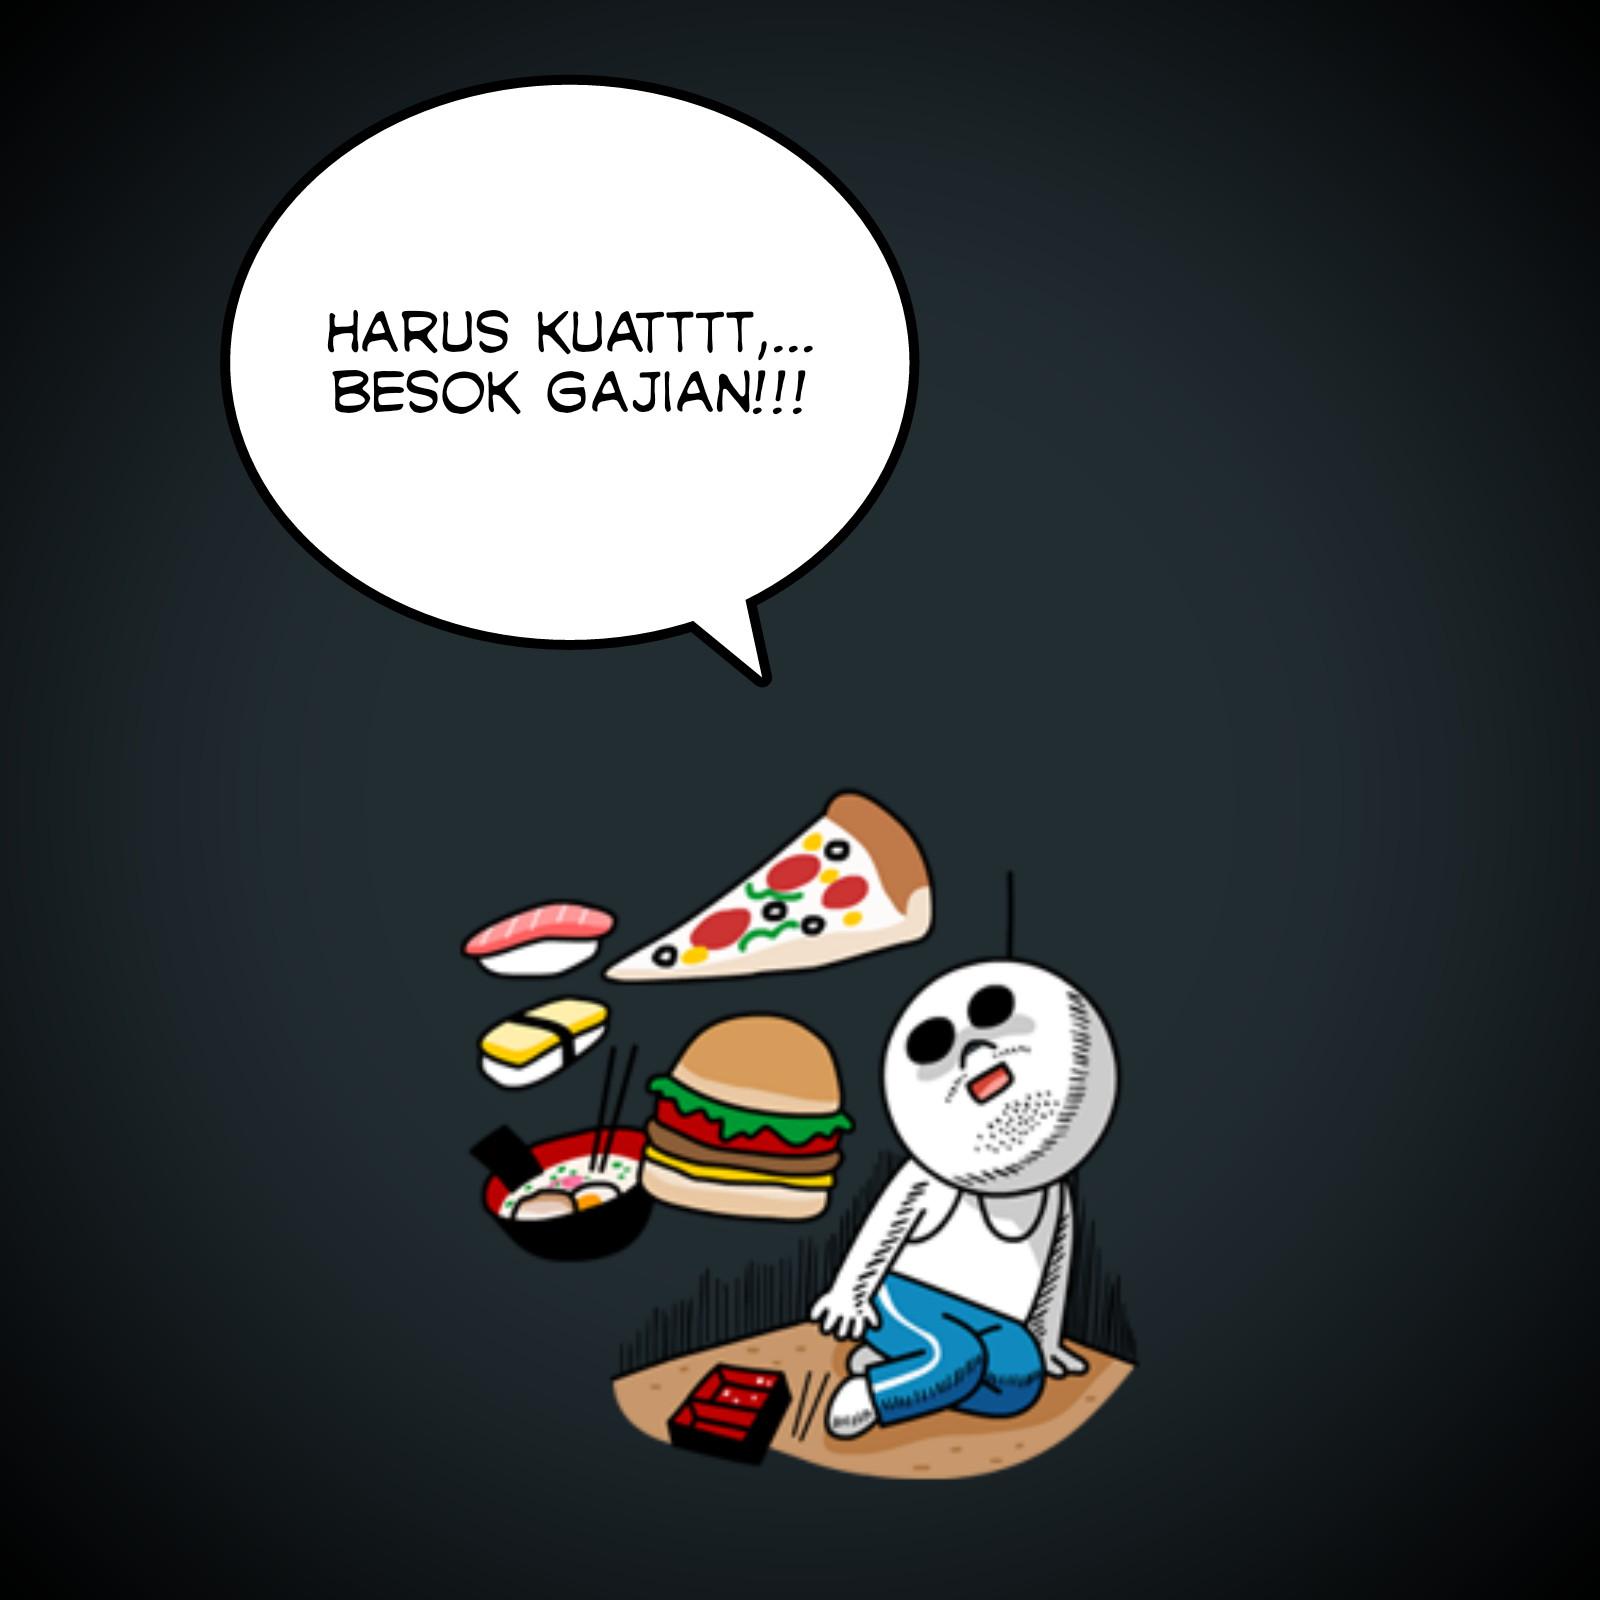 Baca comic strip, rage comic, meme comic, web toon, web comic bahasa Indonesia